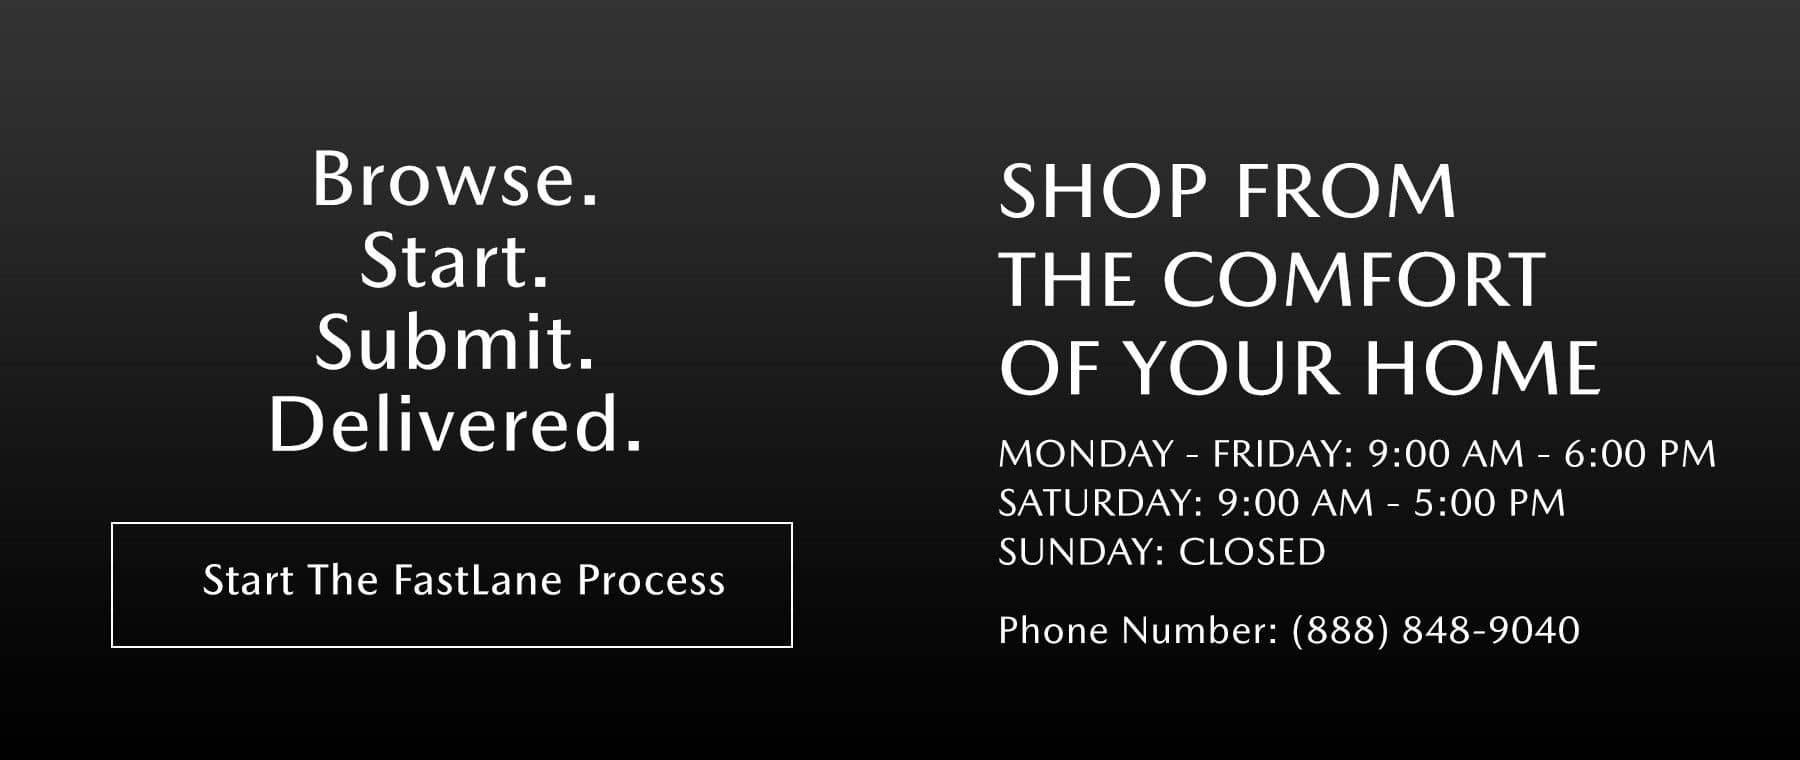 Business hours slide